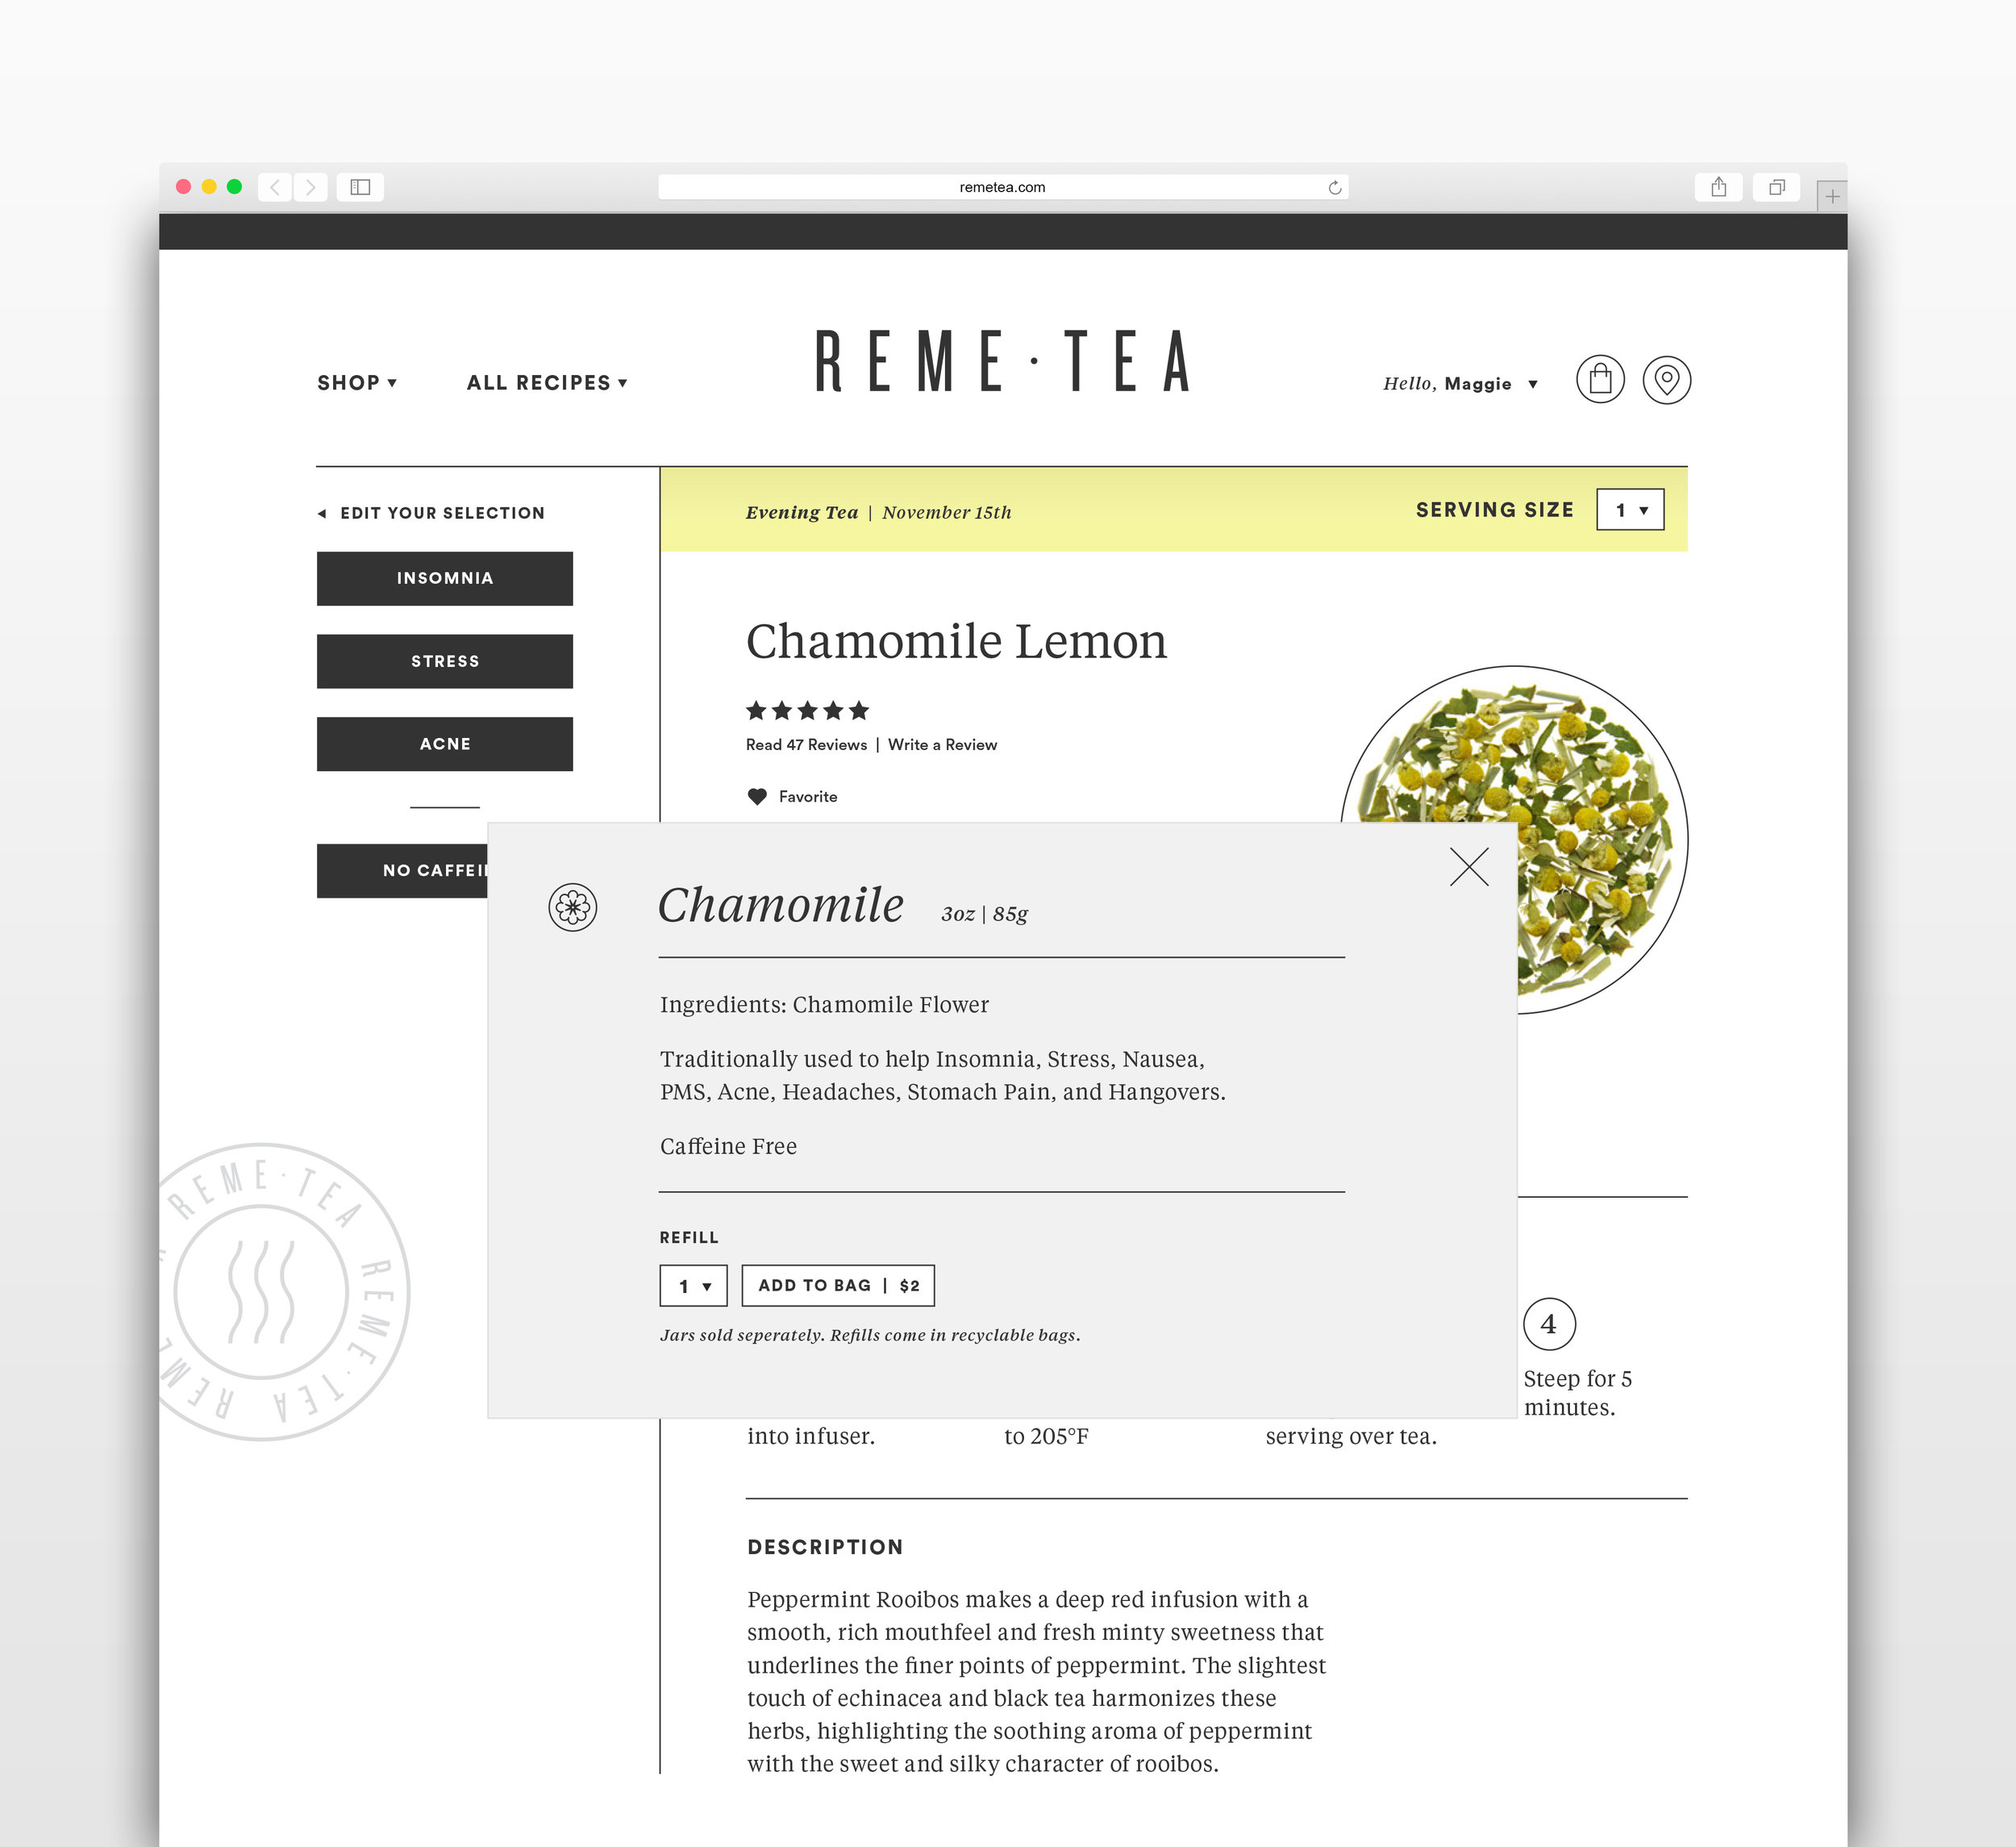 Remetea_Website_Mockup_4.jpg